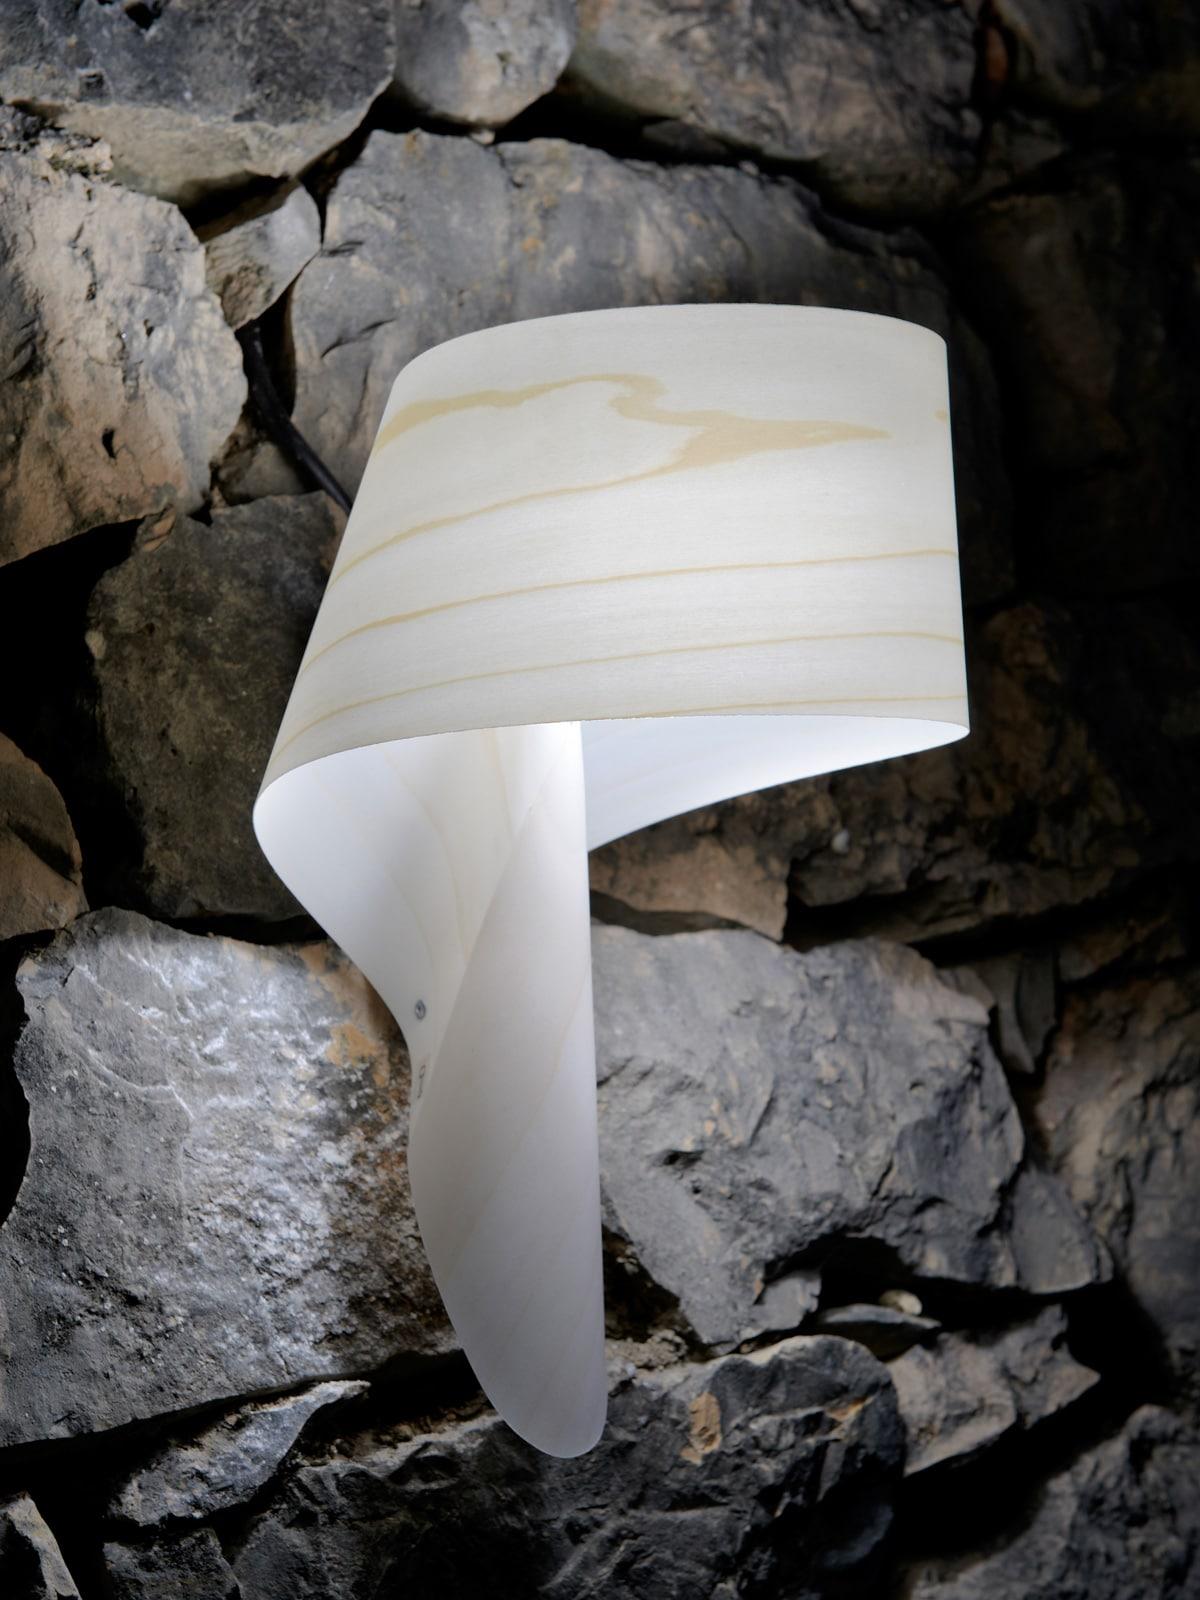 DesignOrt BLog: LZF Lampen Air a Wandlampe